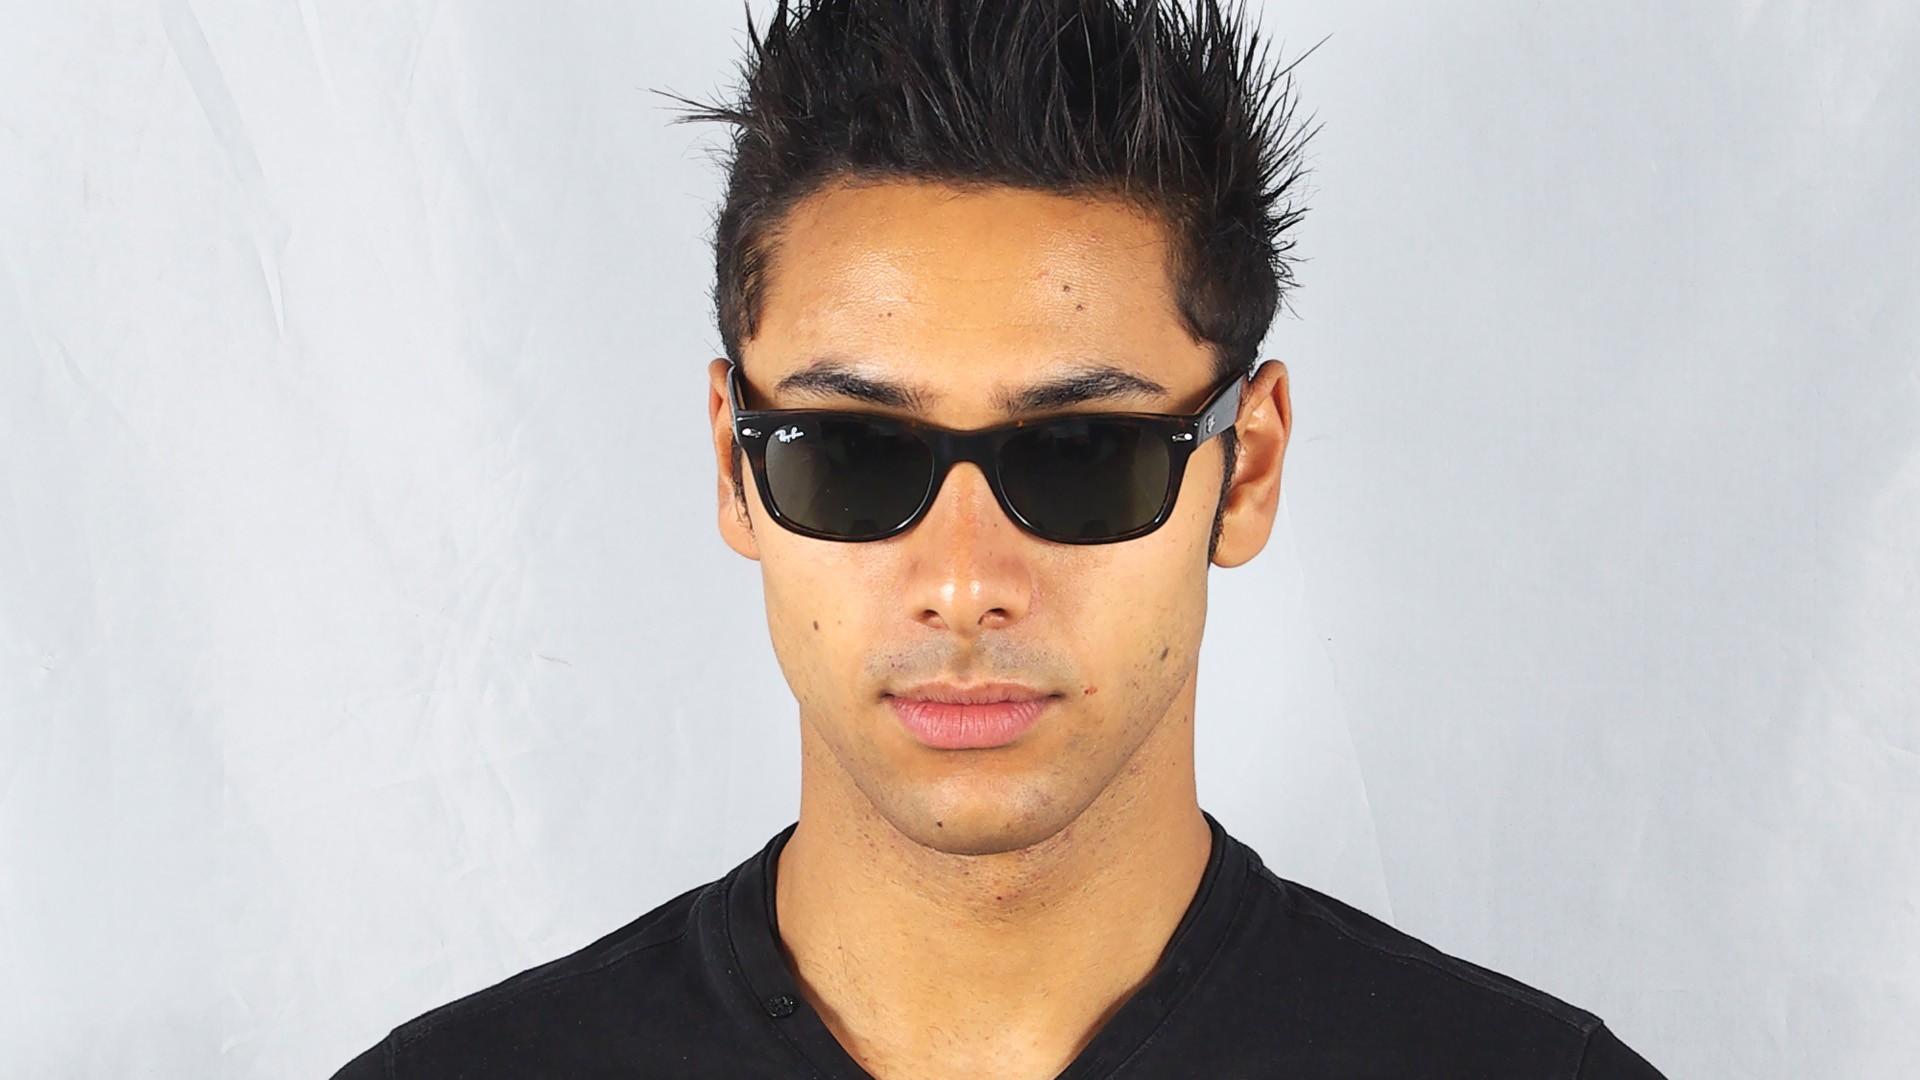 62594d1992ef96 Sunglasses Ray-Ban New Wayfarer Tortoise RB2132 902 52-18 Medium